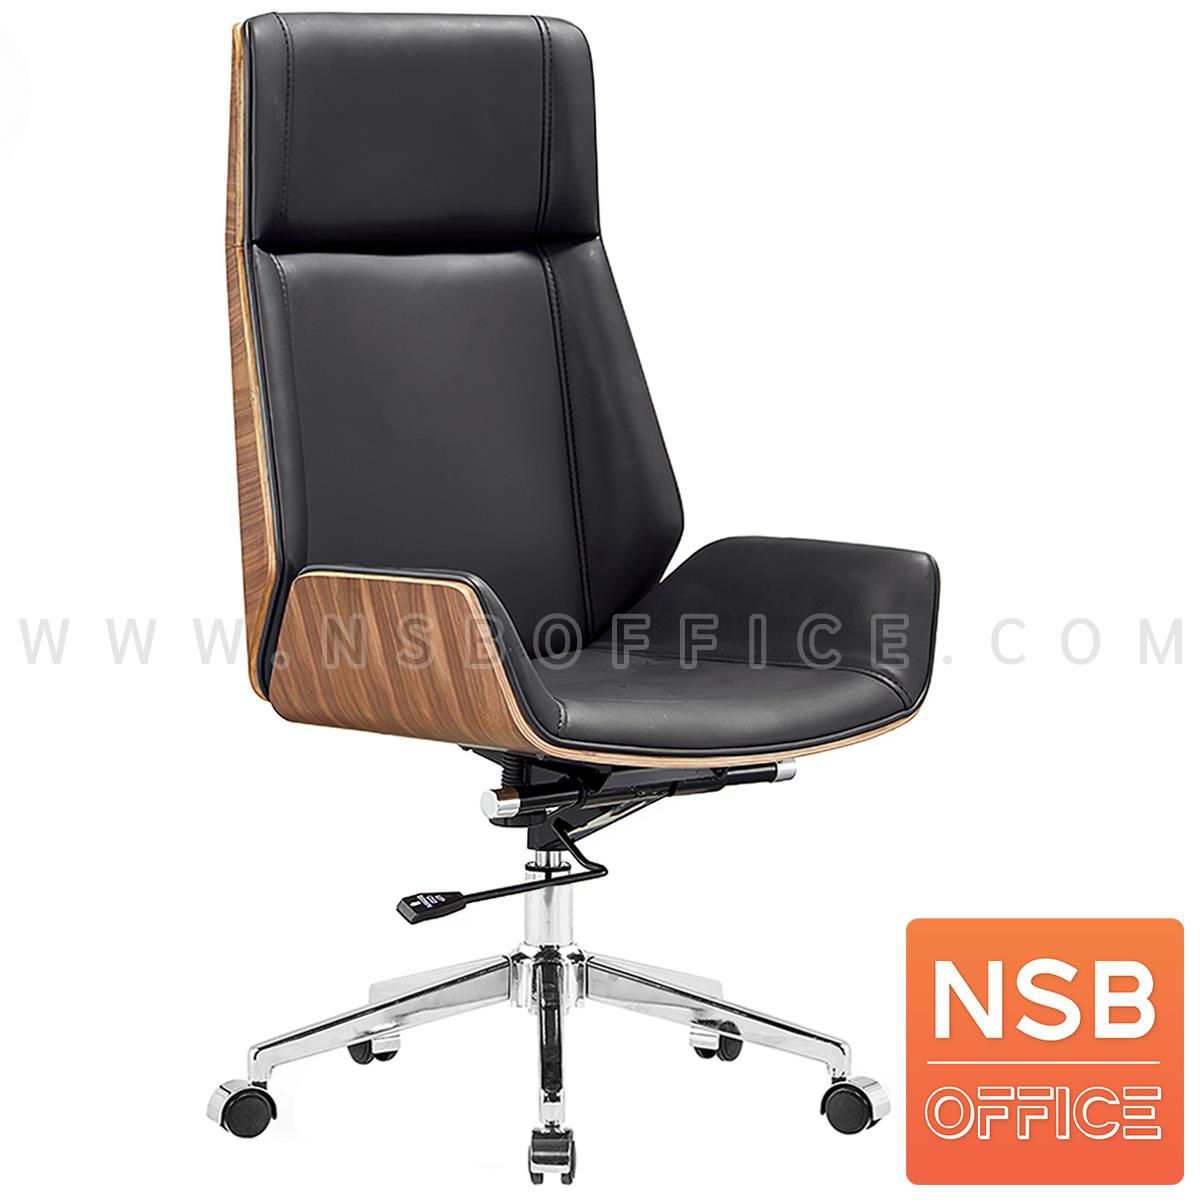 B01A541:เก้าอี้ผู้บริหาร รุ่น Capella (คาเพลล่า)  โช๊คแก๊ส ขาอลูมิเนียม